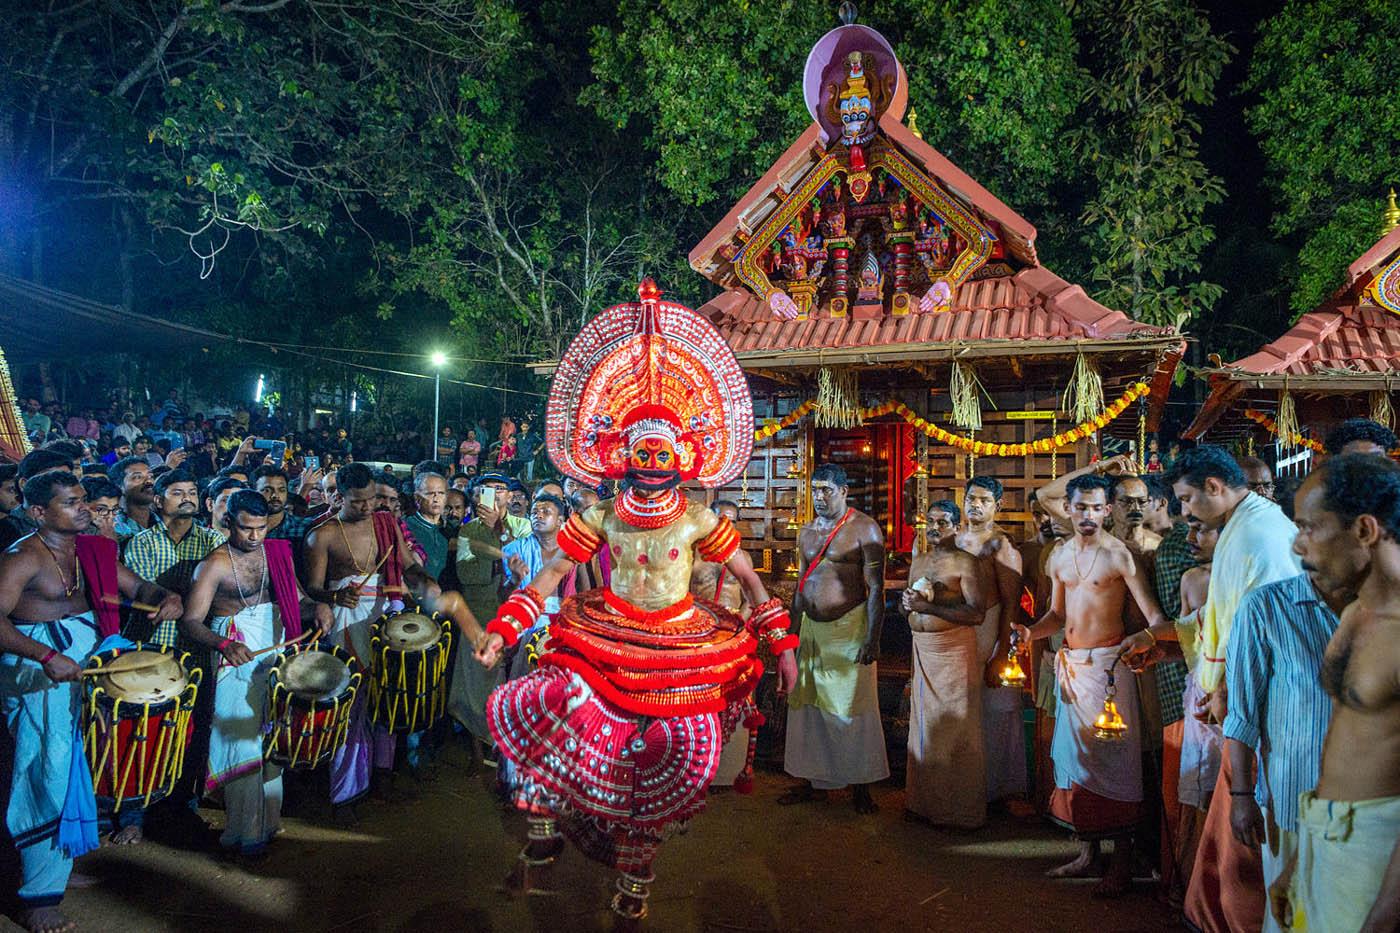 travel photography indian kannur theyyam by saravanan dhandapani